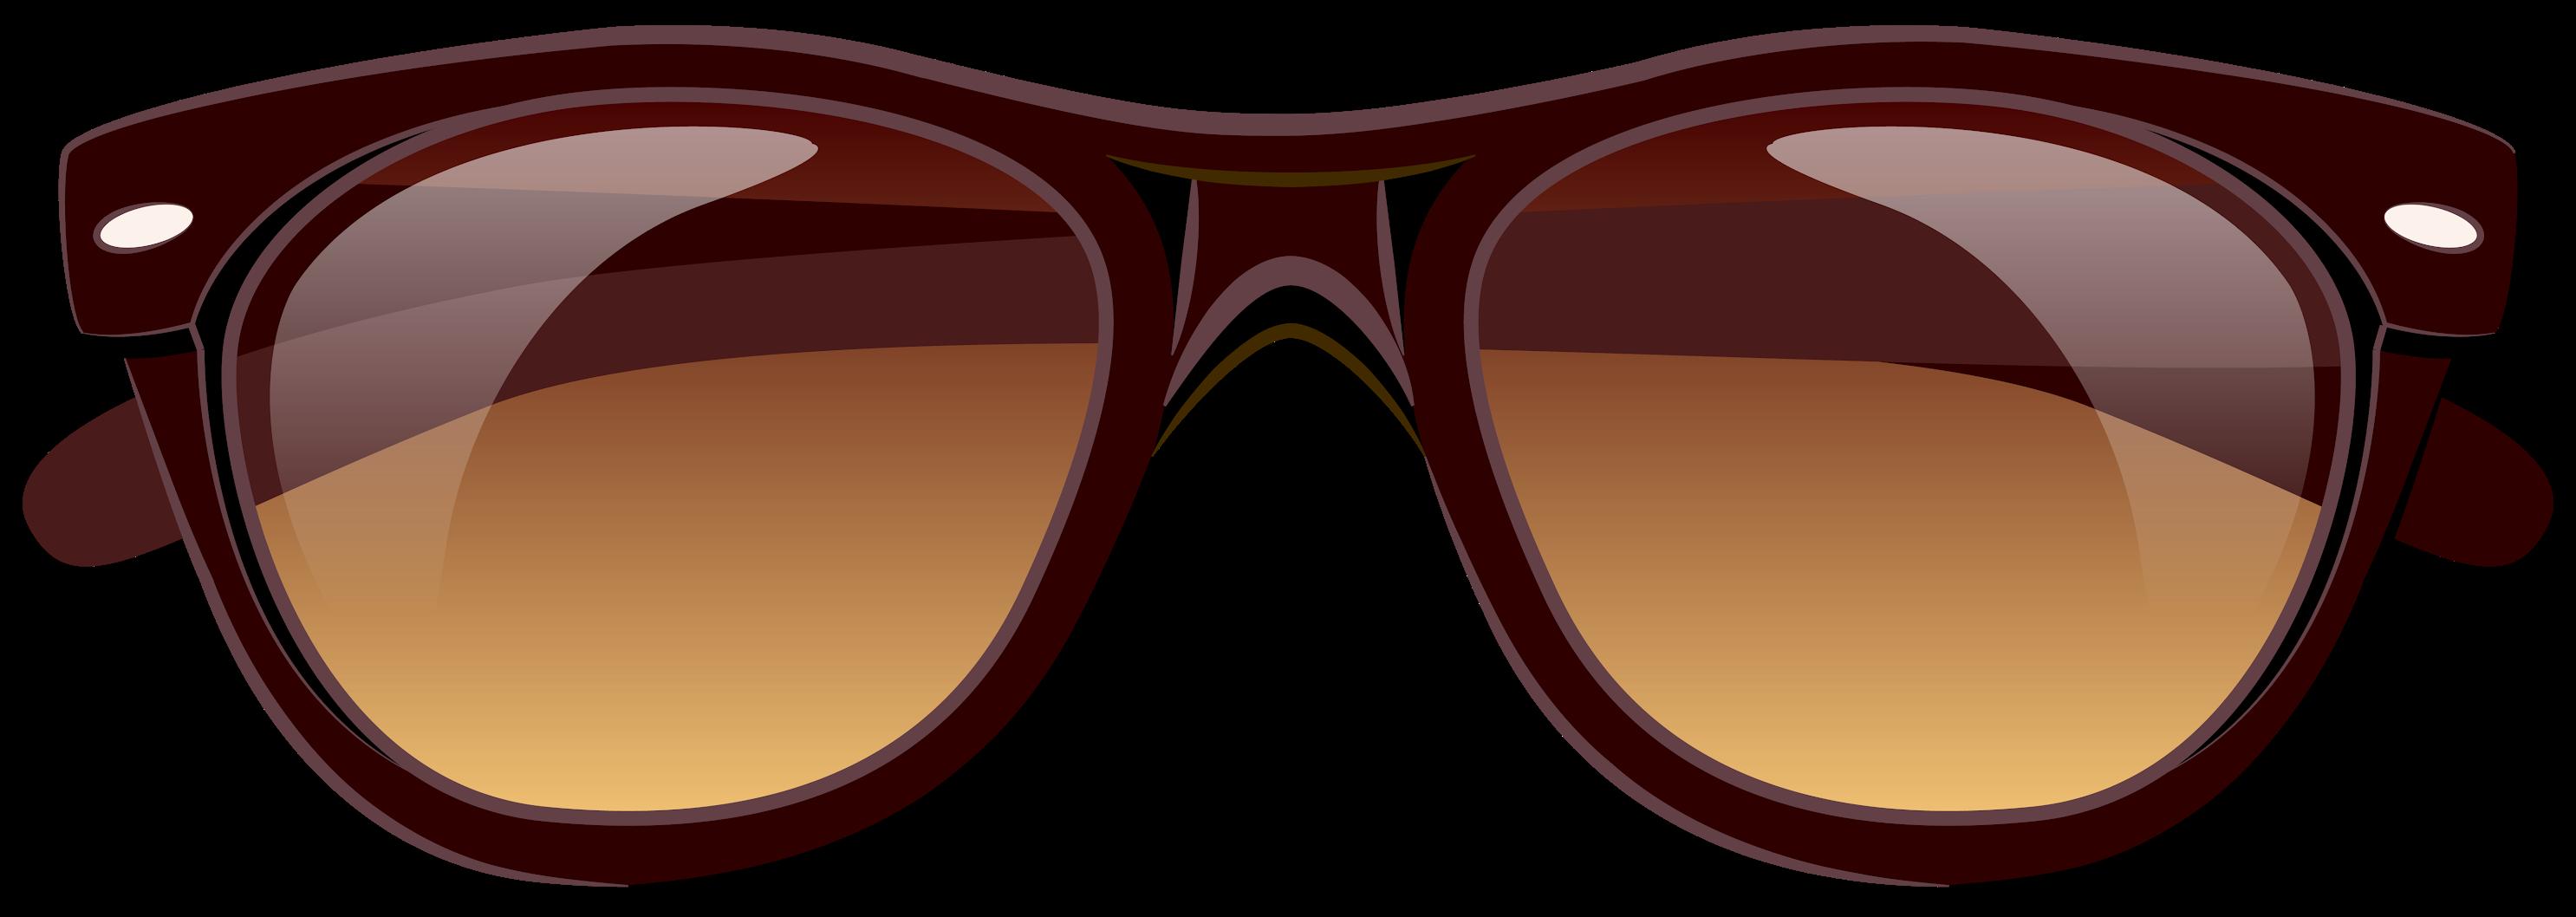 Cat Eye Glasses Sunglasses Clip Art Glasses Png Image Clip On Sunglasses Cat Eye Glasses Sunglasses